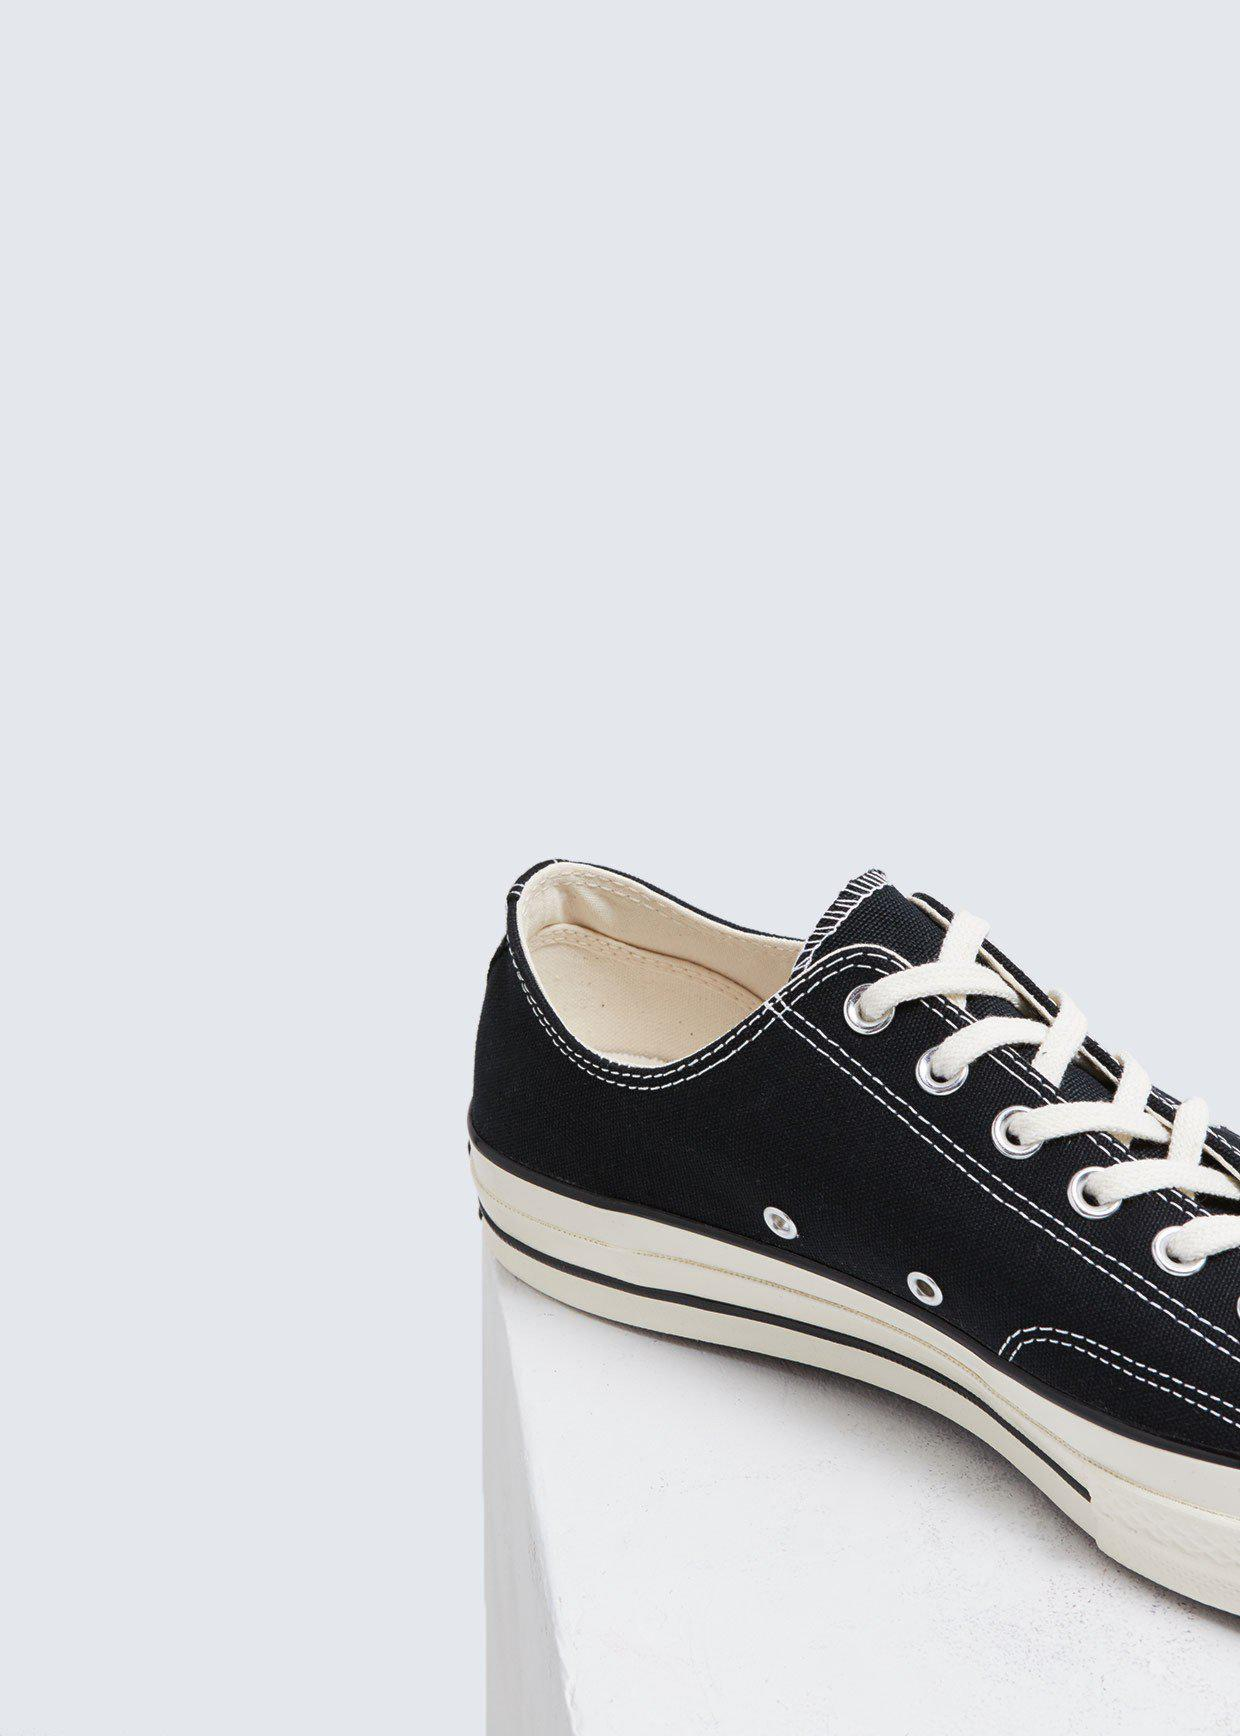 Converse - Black Chuck Taylor 70 Ox Low for Men - Lyst. View fullscreen 39edc76b6